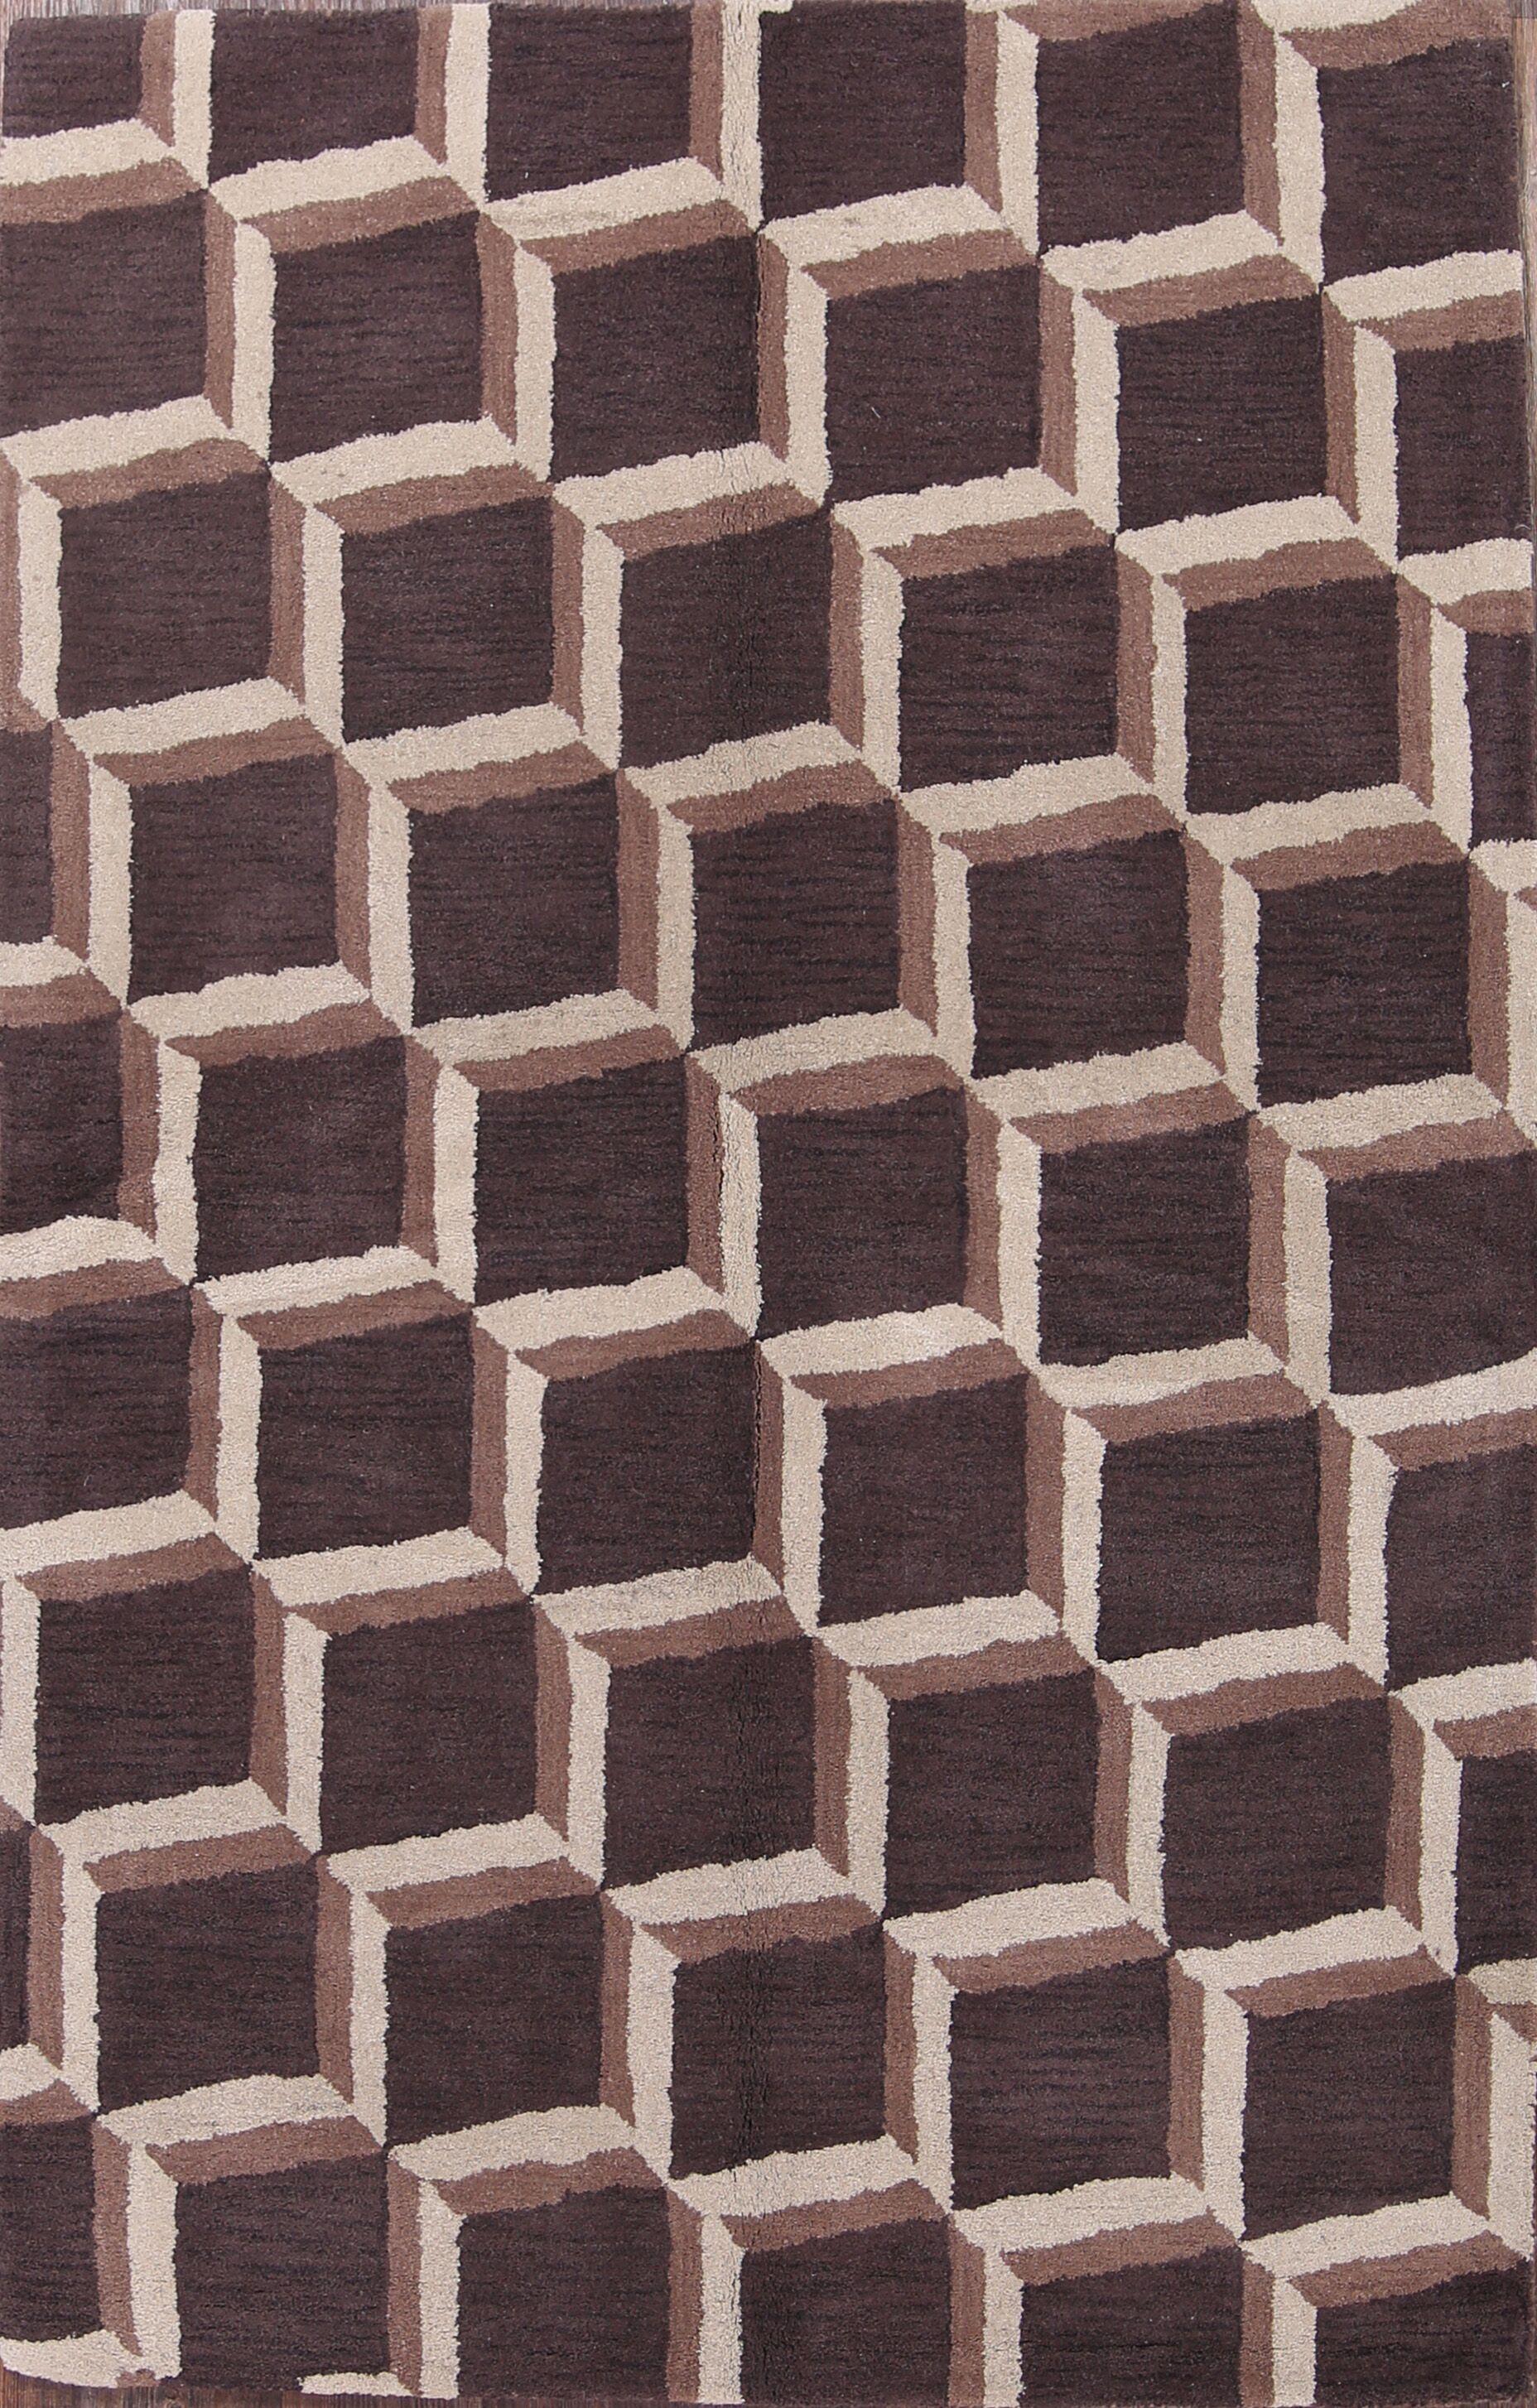 Seidman Oriental Hand-Tufted Wool Beige/Brown Area Rug Rug Size: Rectangle 5'1